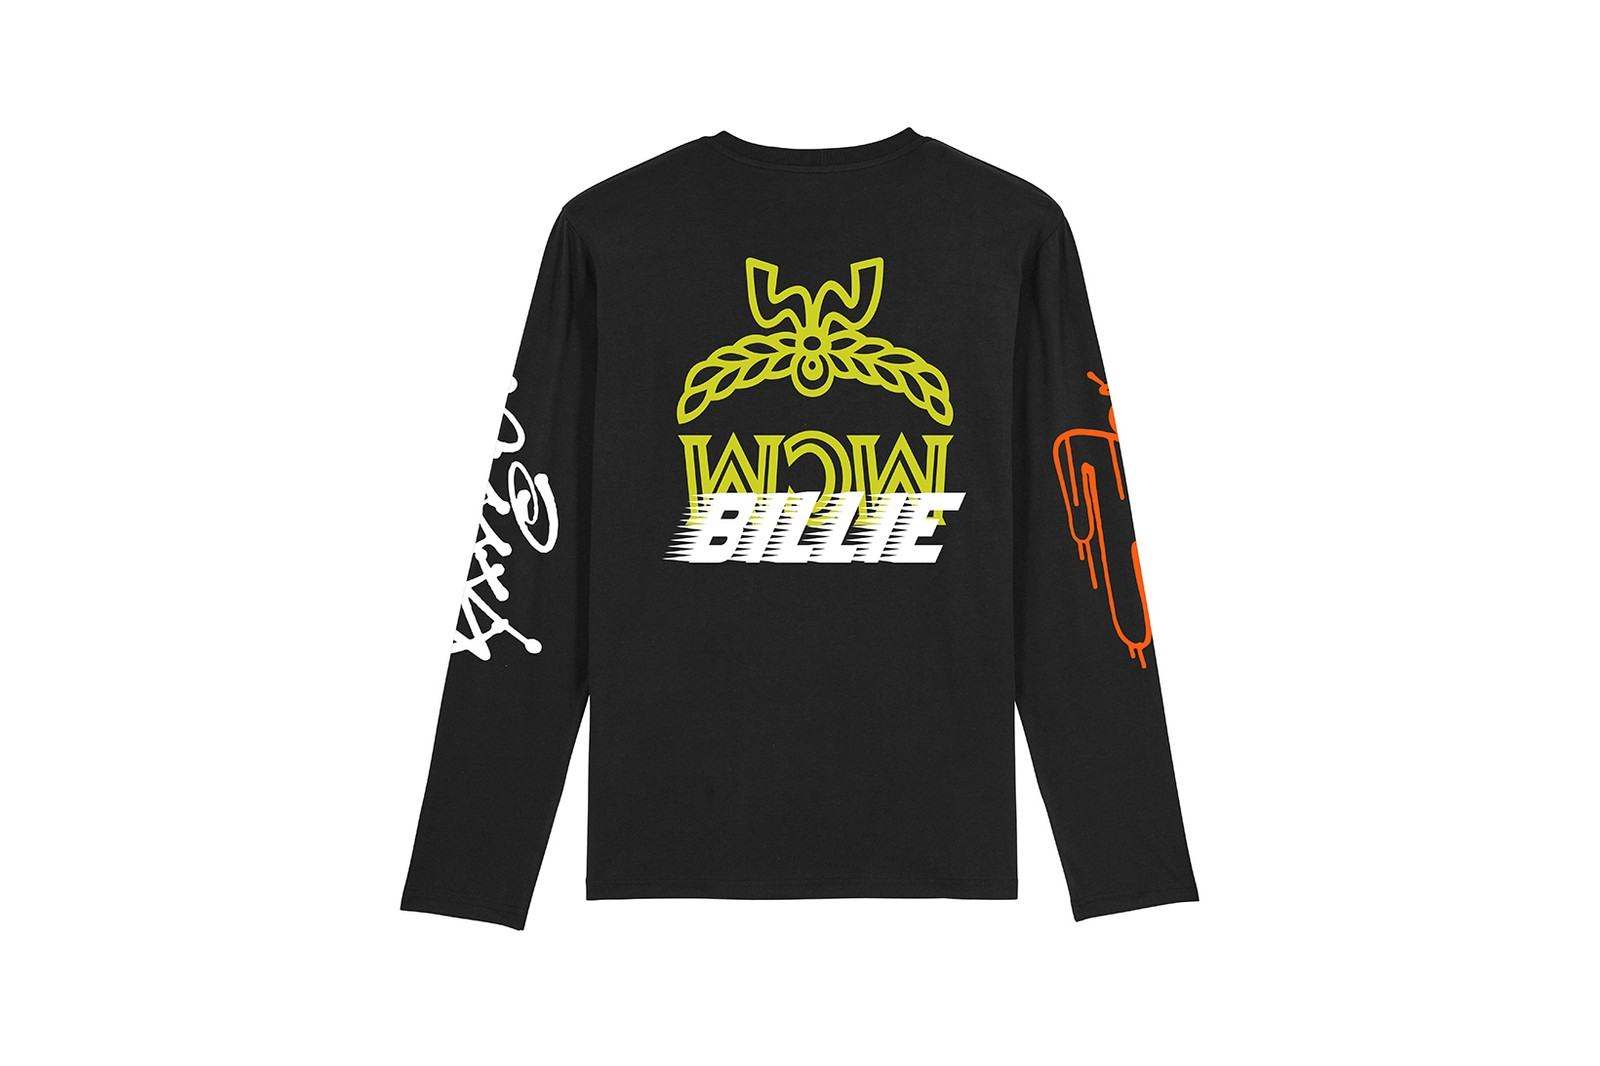 billie eilish mcm pop up store 1976 berlin flagship collaboration blohsh merch hoodies shirts